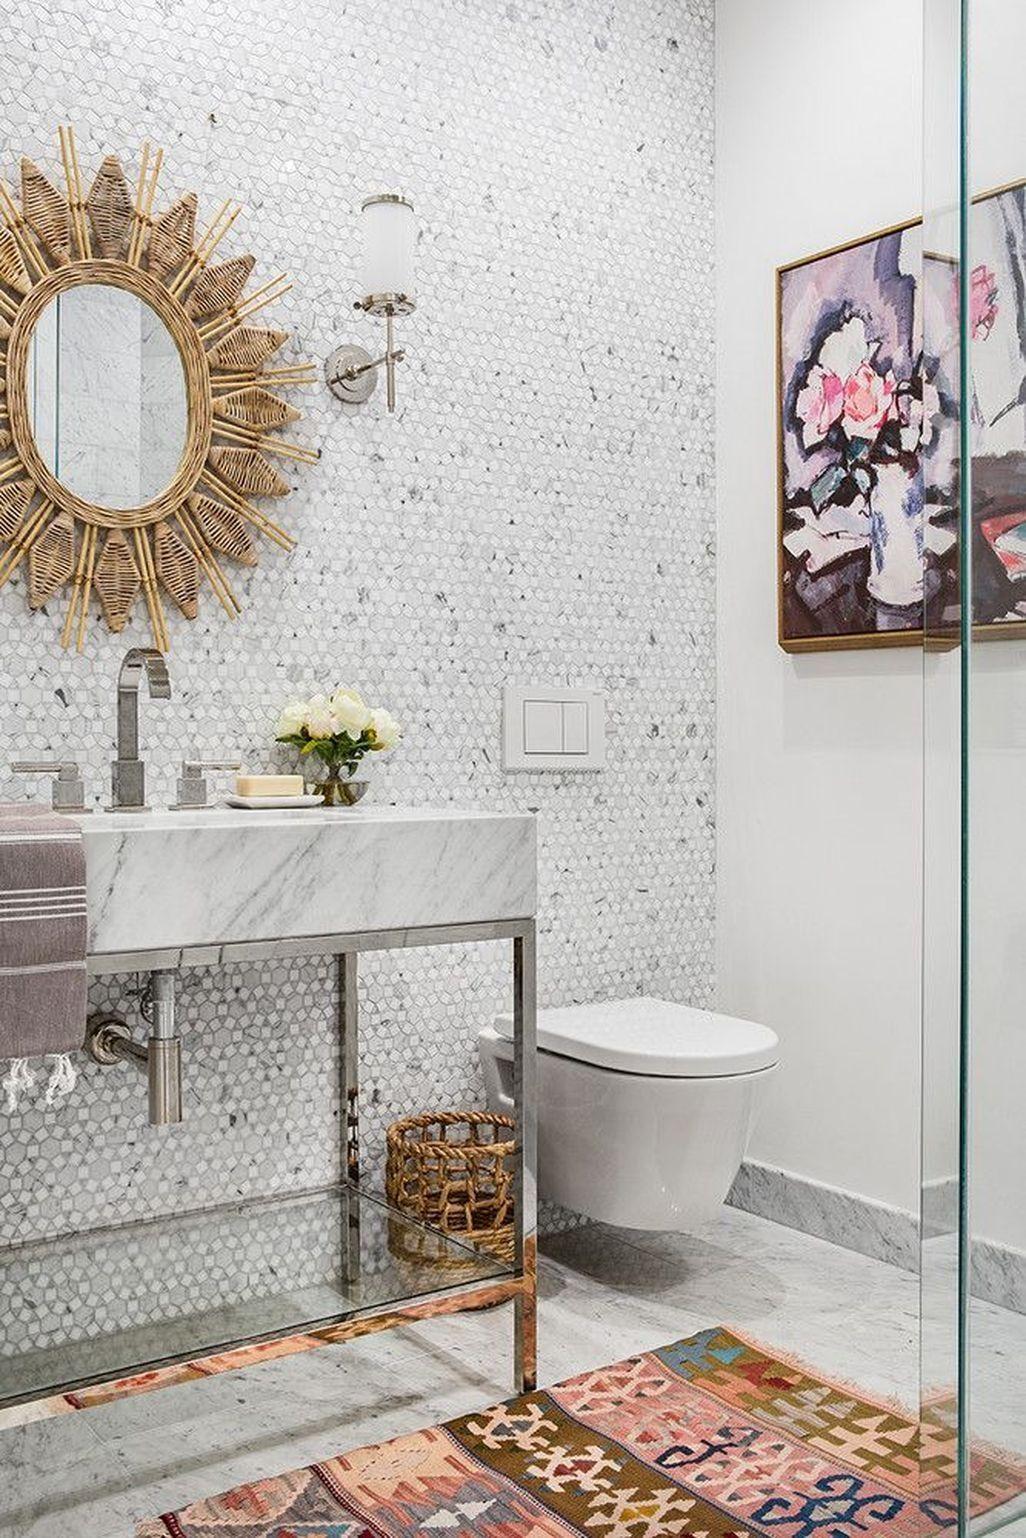 A Bathroom Designs Idea Can I Really Design My Own Bathroom Why Not Today The Bathroom Is Trendy Bathroom Tiles Elegant Bathroom Design Bathroom Wall Tile